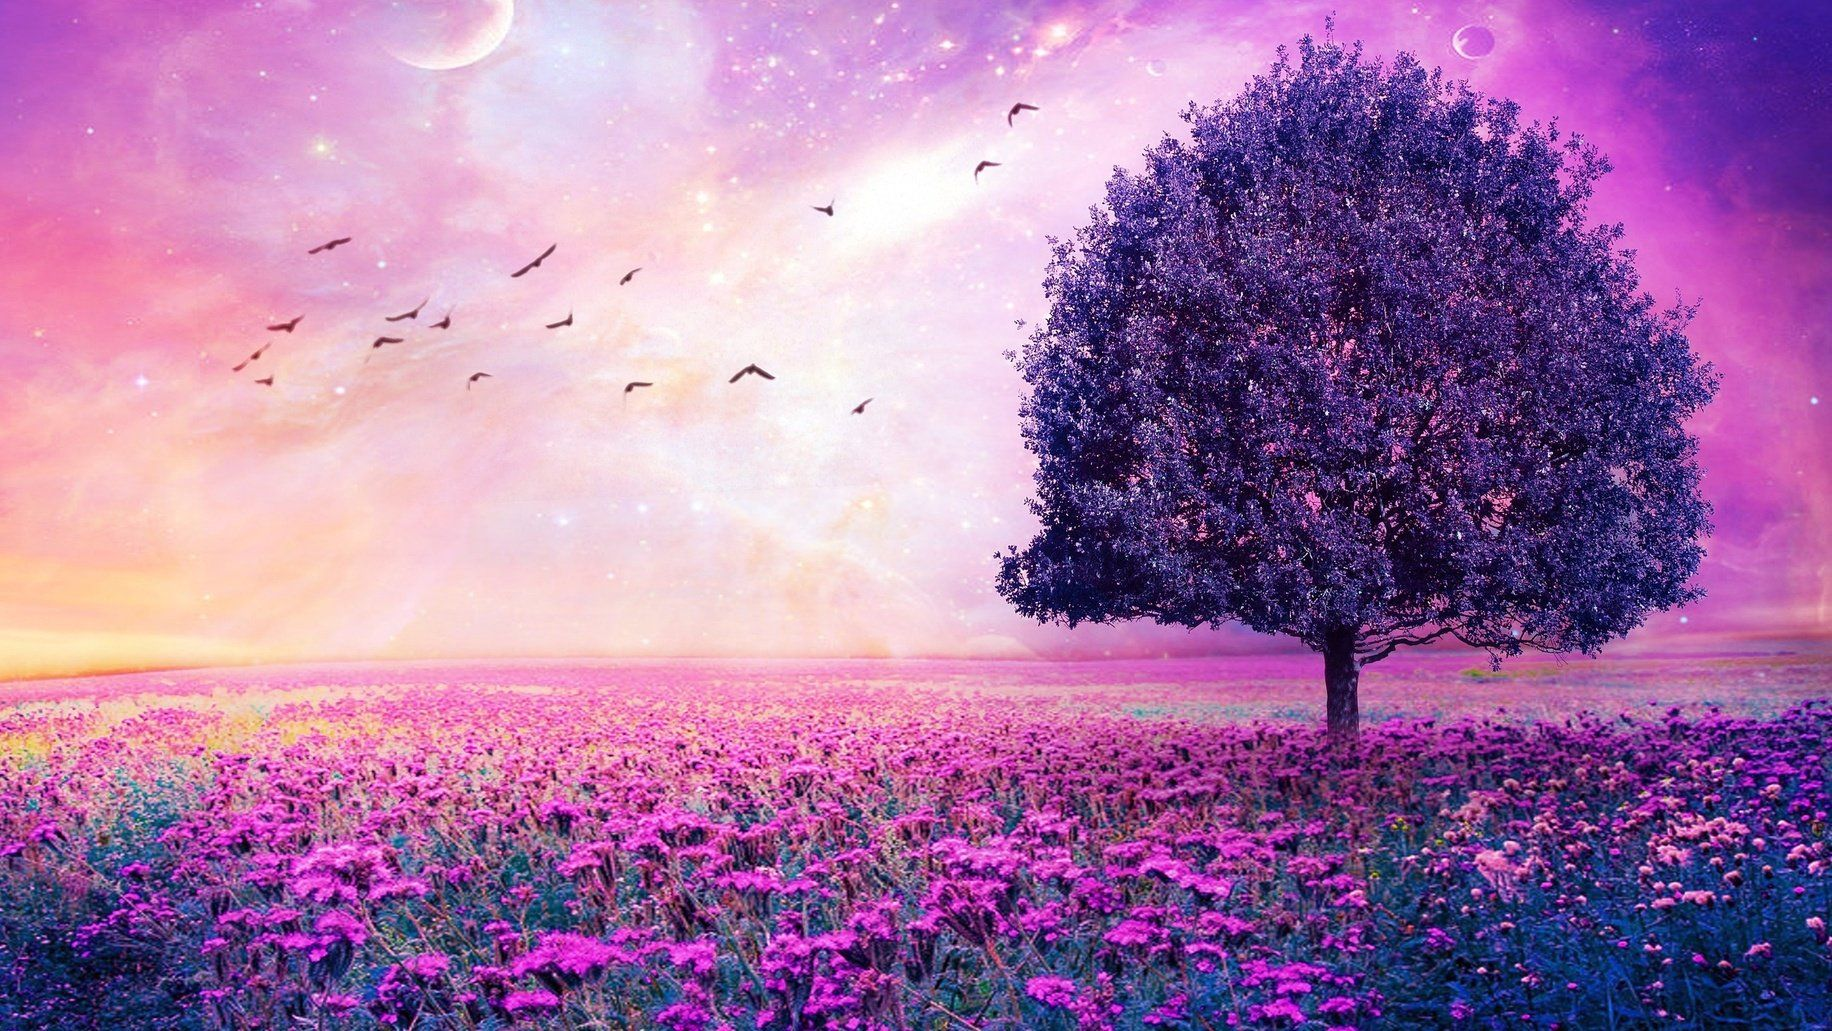 Imagenes Full Hd En 3d Beautiful Tree Girl Wallpaper Cute Wallpapers